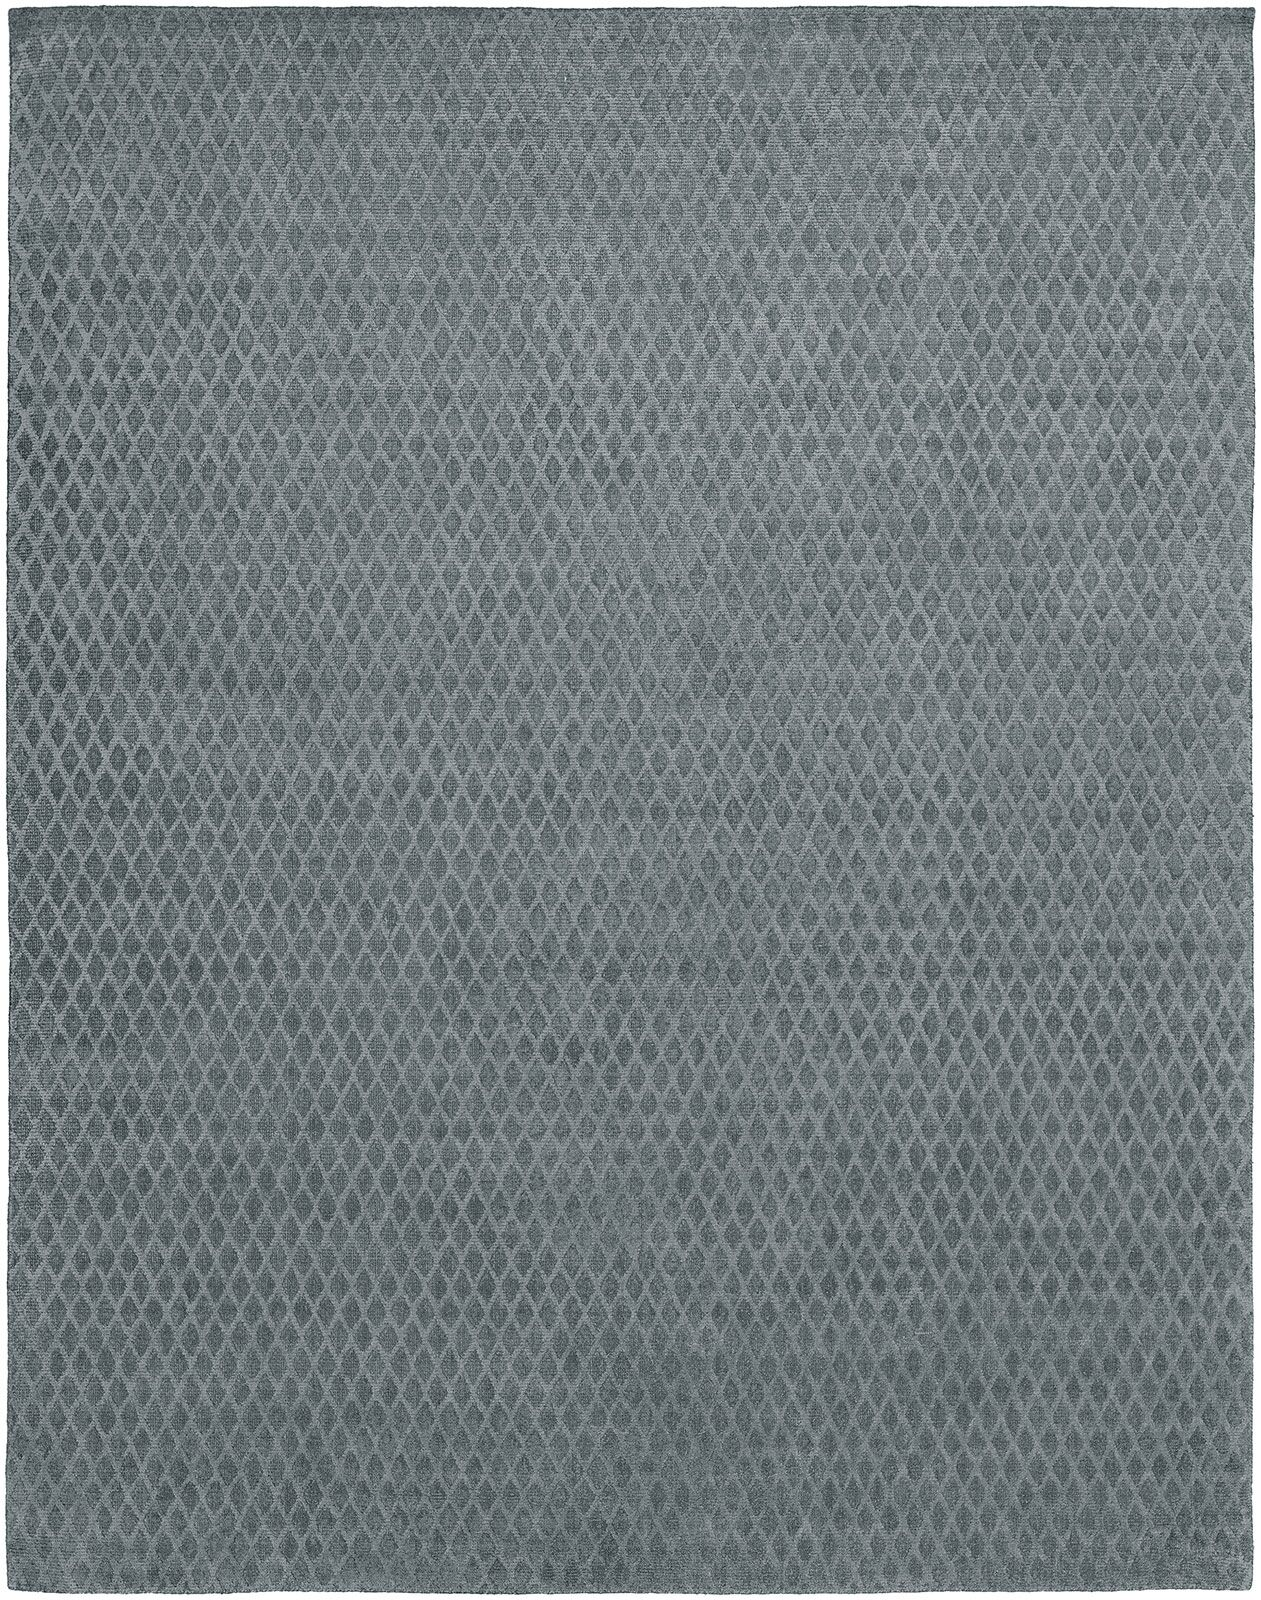 Hand-Woven Gray Area Rug Rug Size: 6' x 9'